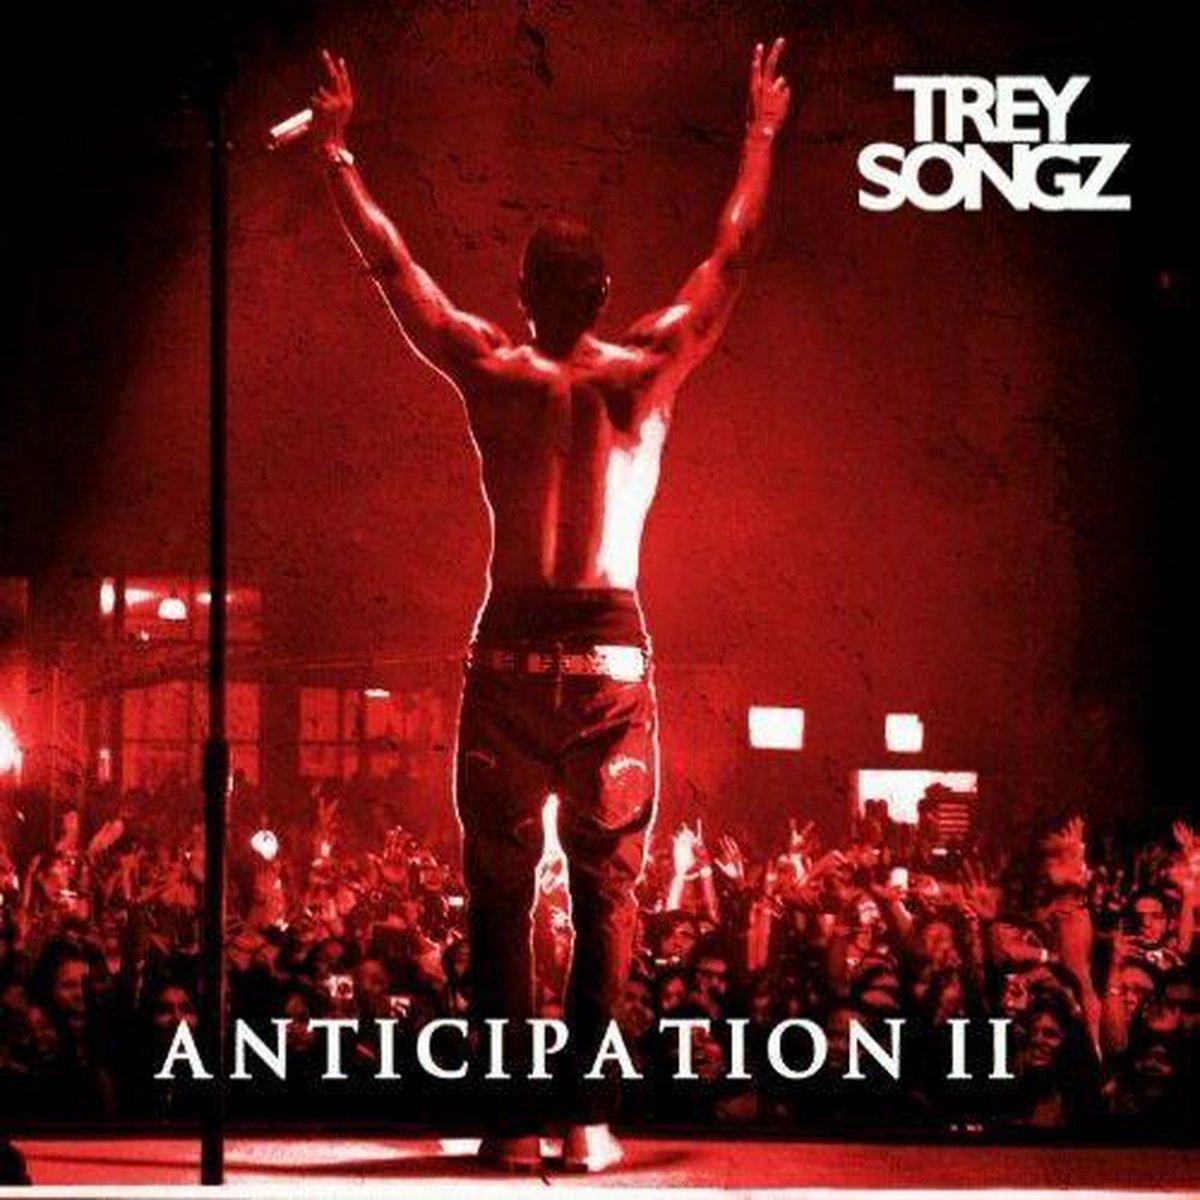 Anticipation 2 - Trey Songz